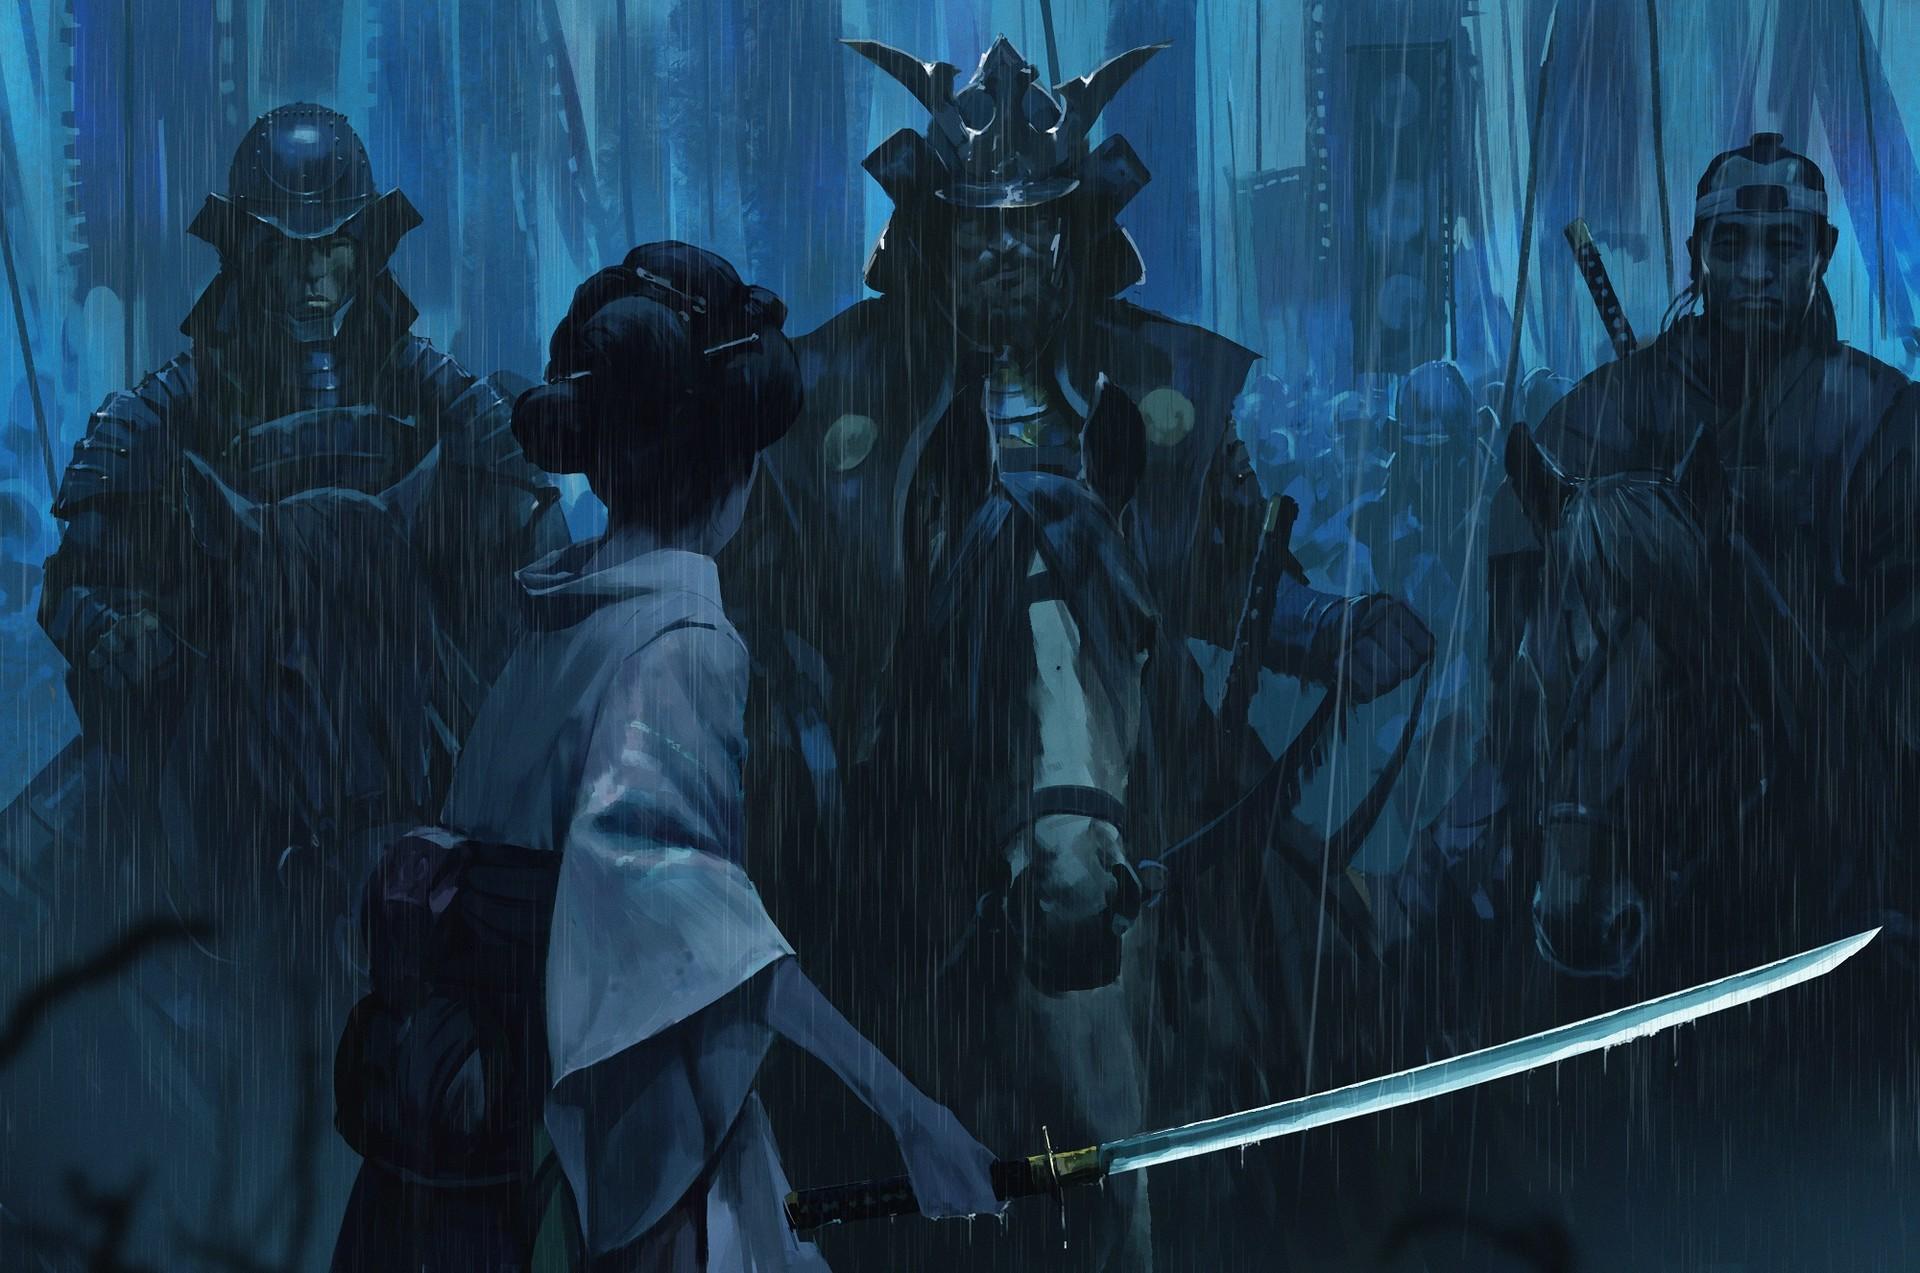 Wallpaper Katana Samurai Army Geisha Rain Armor